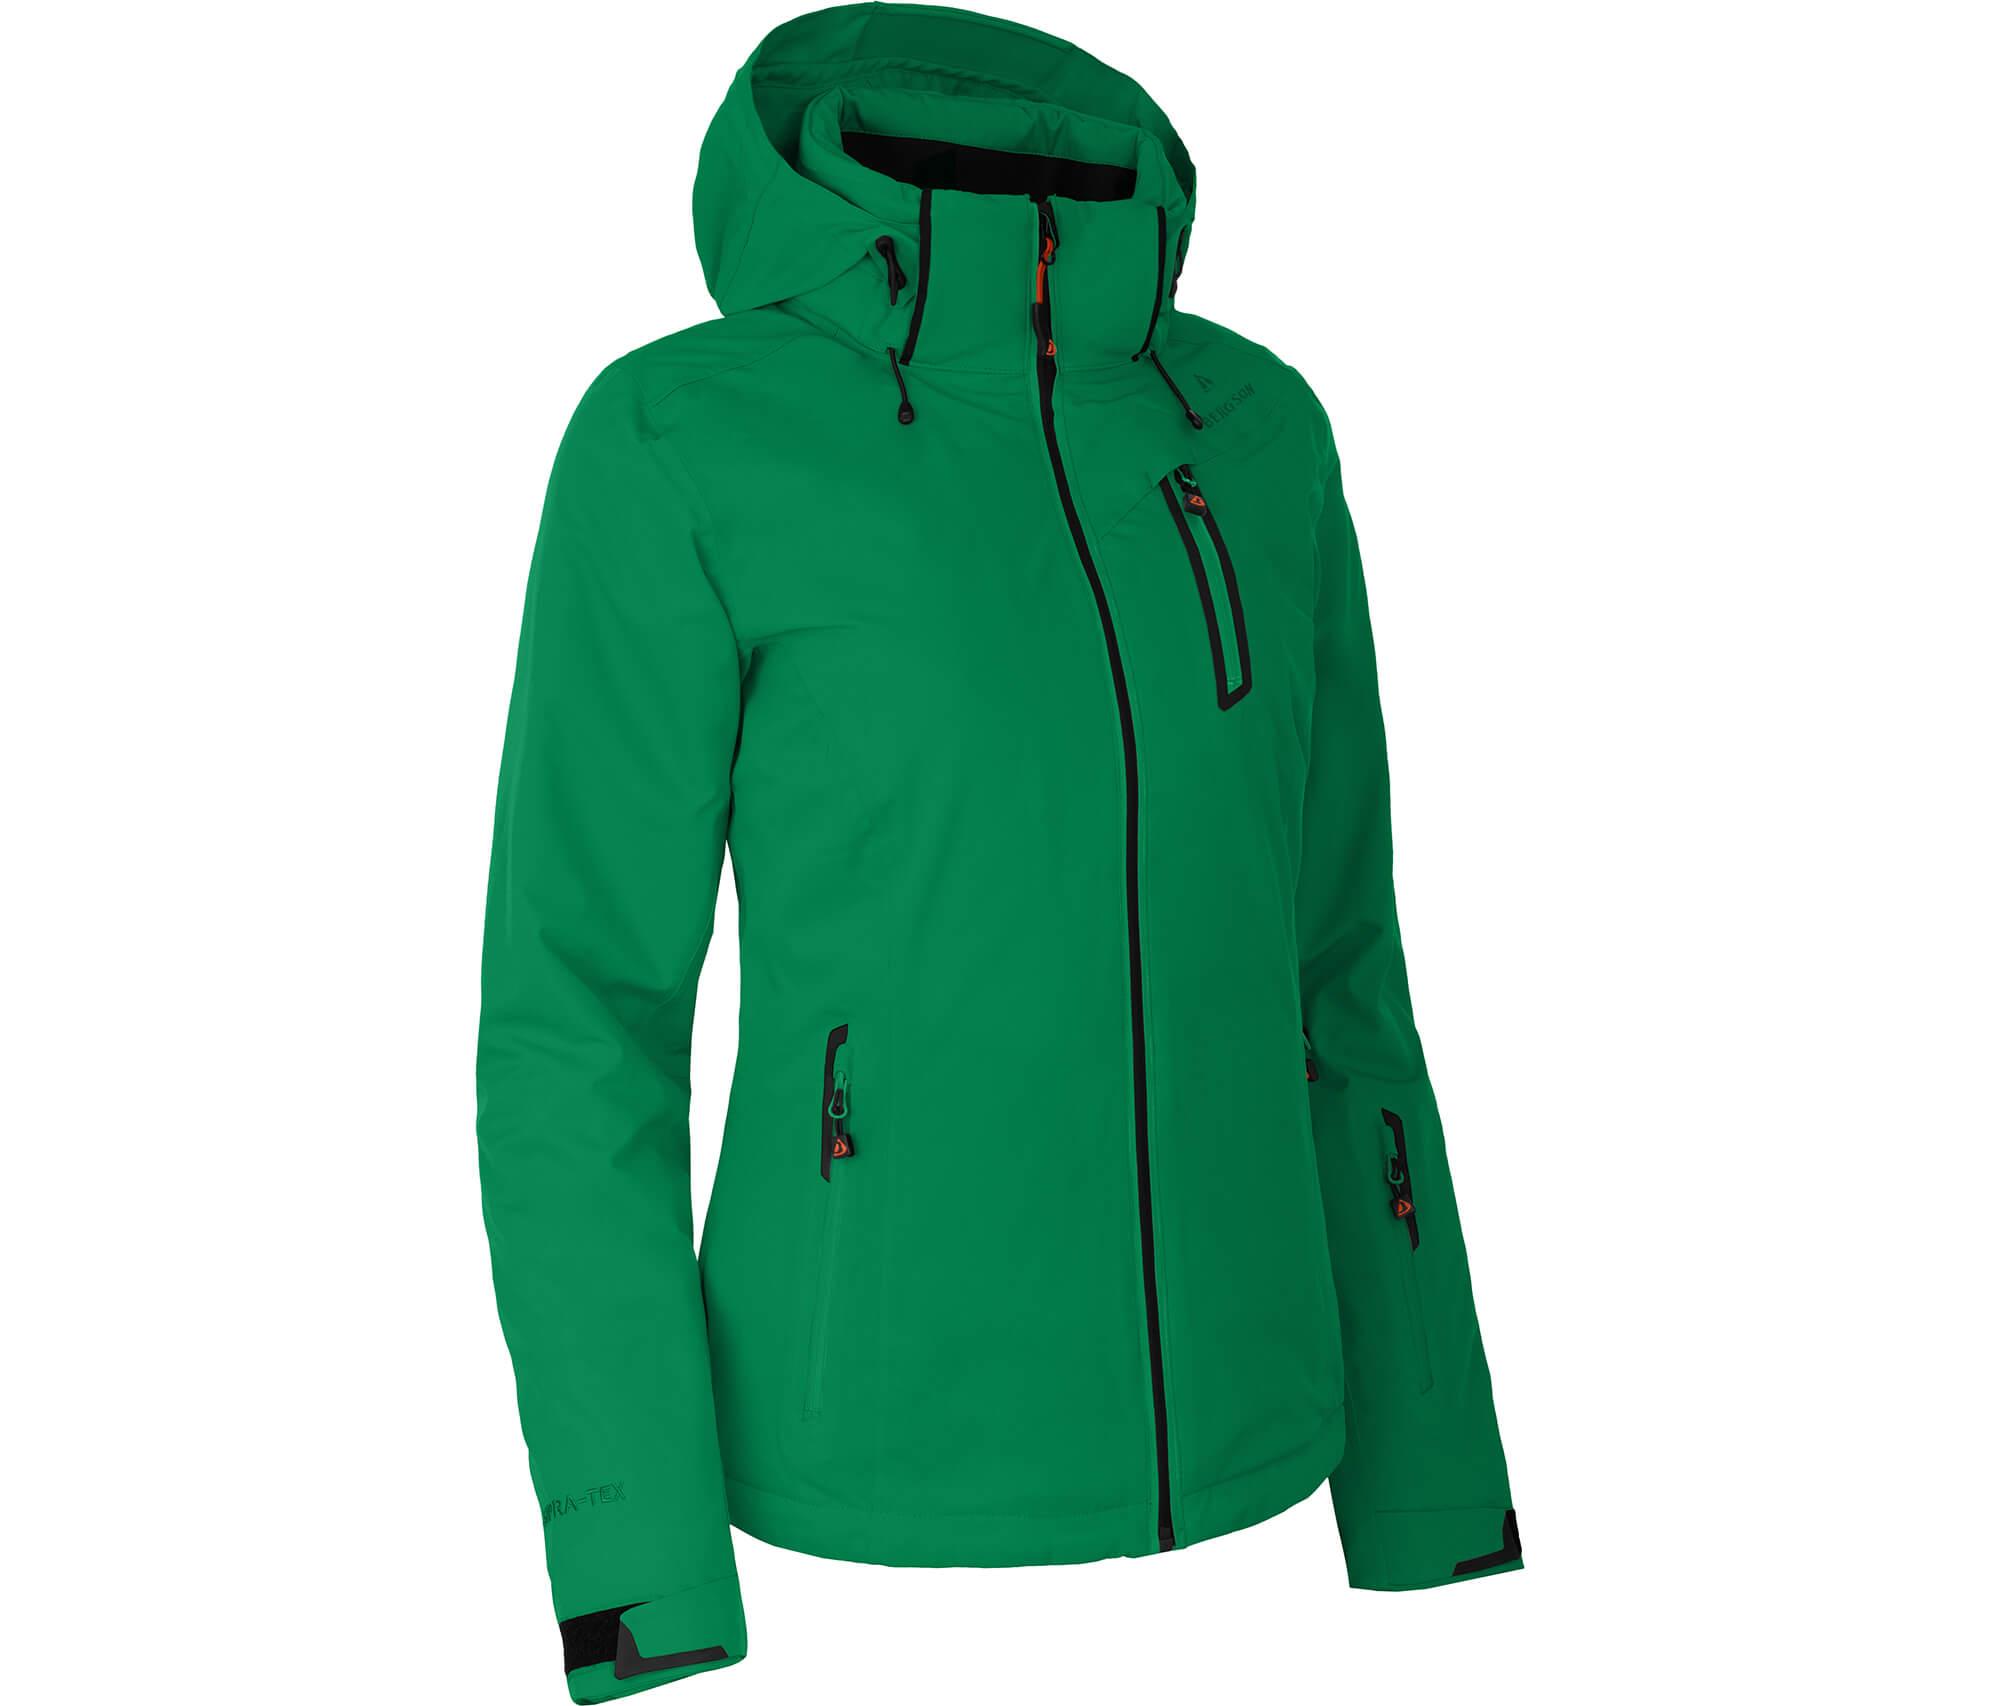 Bergson Damen Skijacke NICE grün